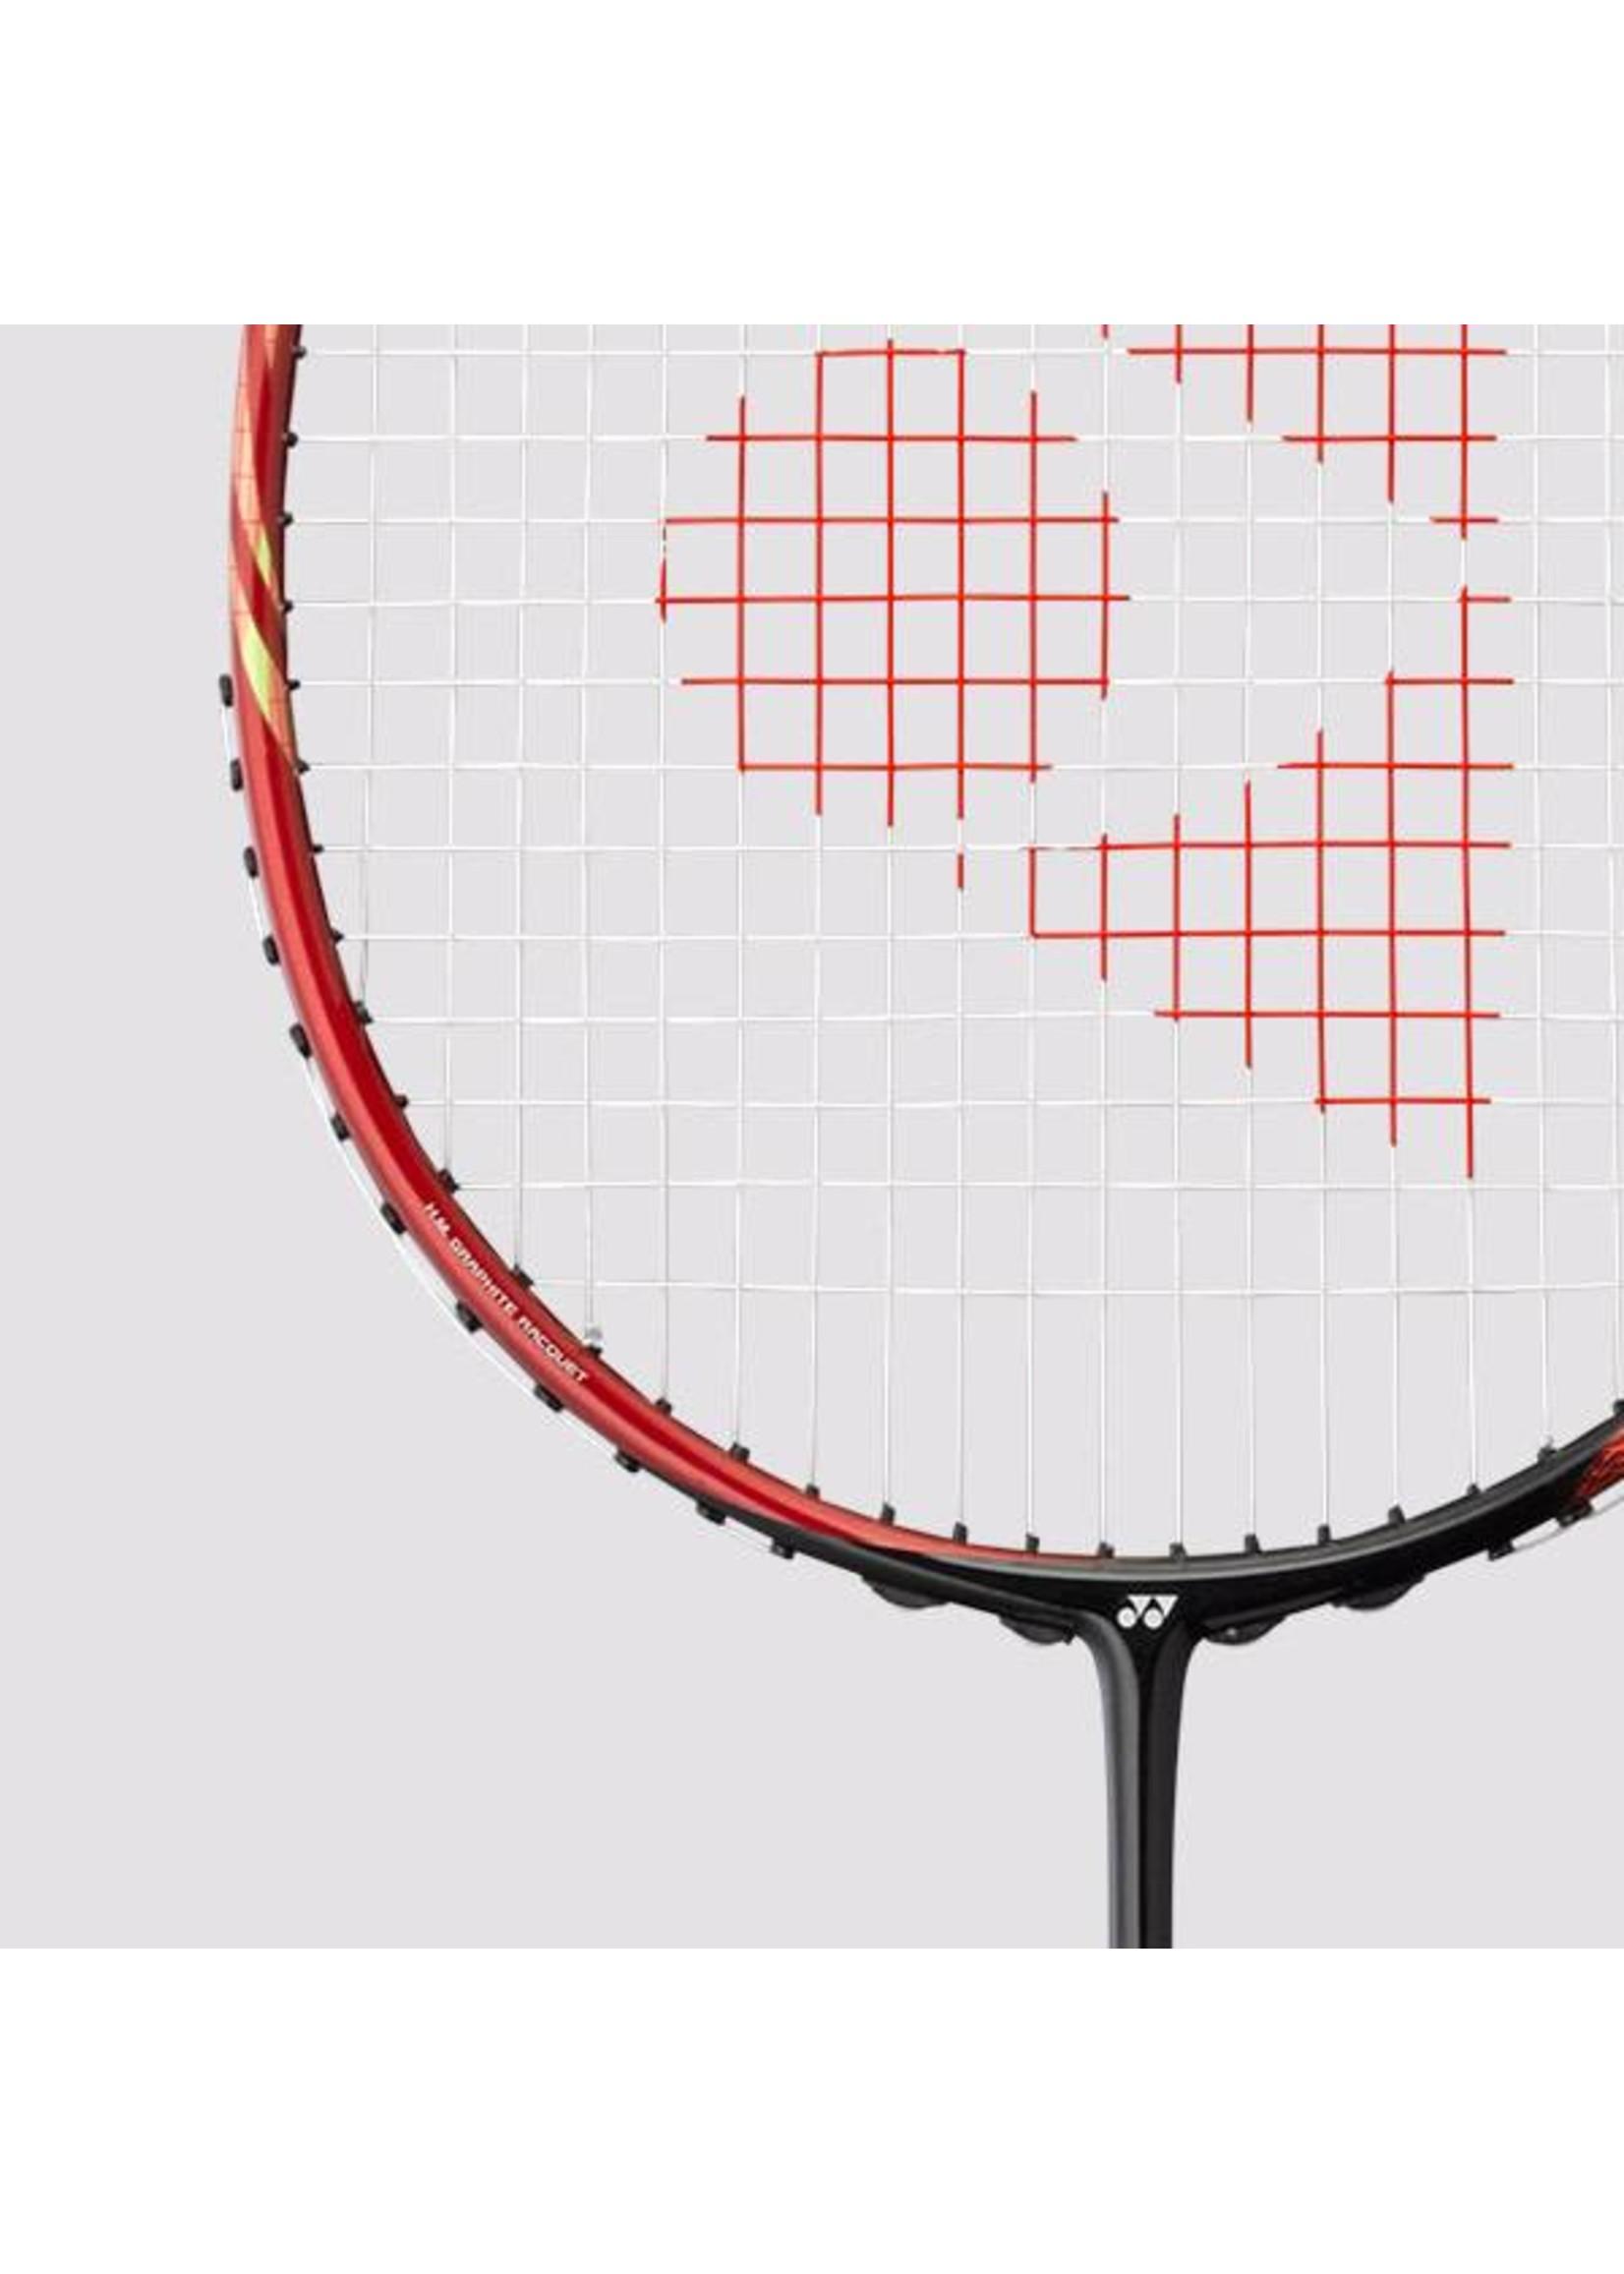 Yonex Yonex Astrox 9 Badminton Racket (2019)